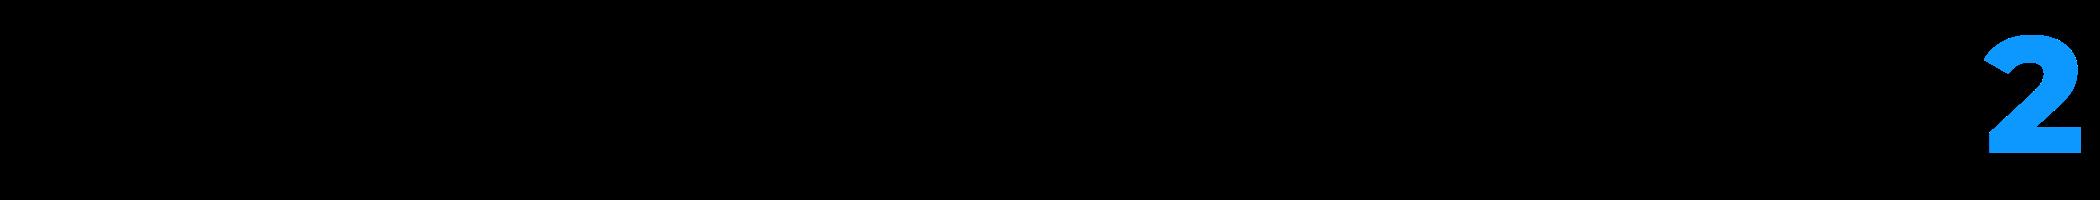 dwp_logo_full_black.png